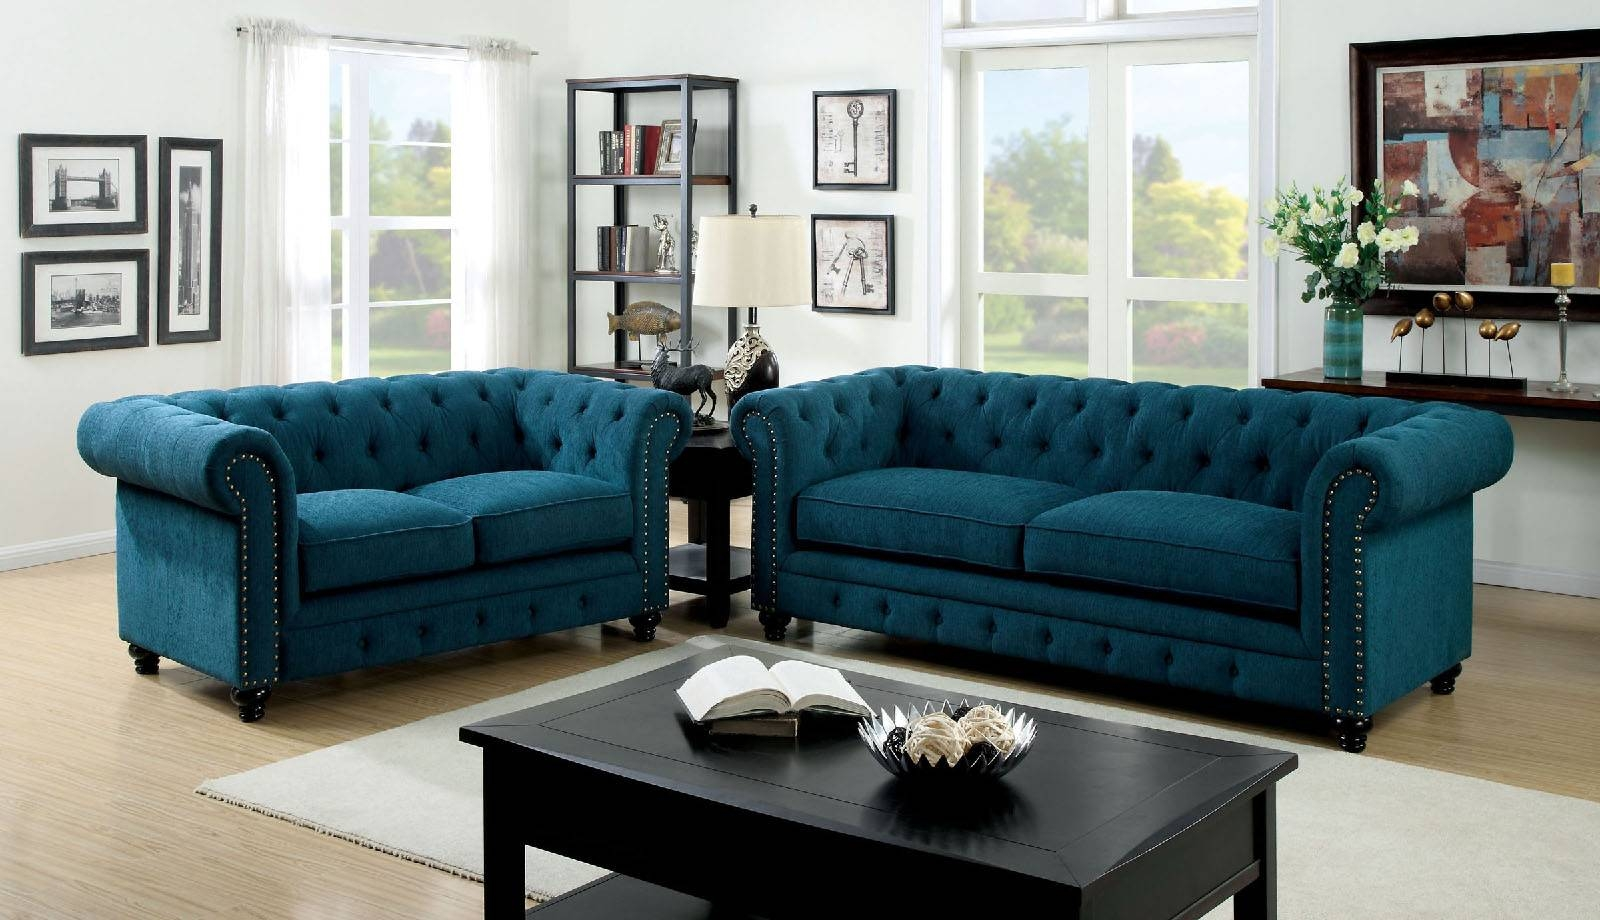 Blue Tufted Sofa Set | Tehranmix Decoration pertaining to Blue Tufted Sofas (Image 6 of 30)